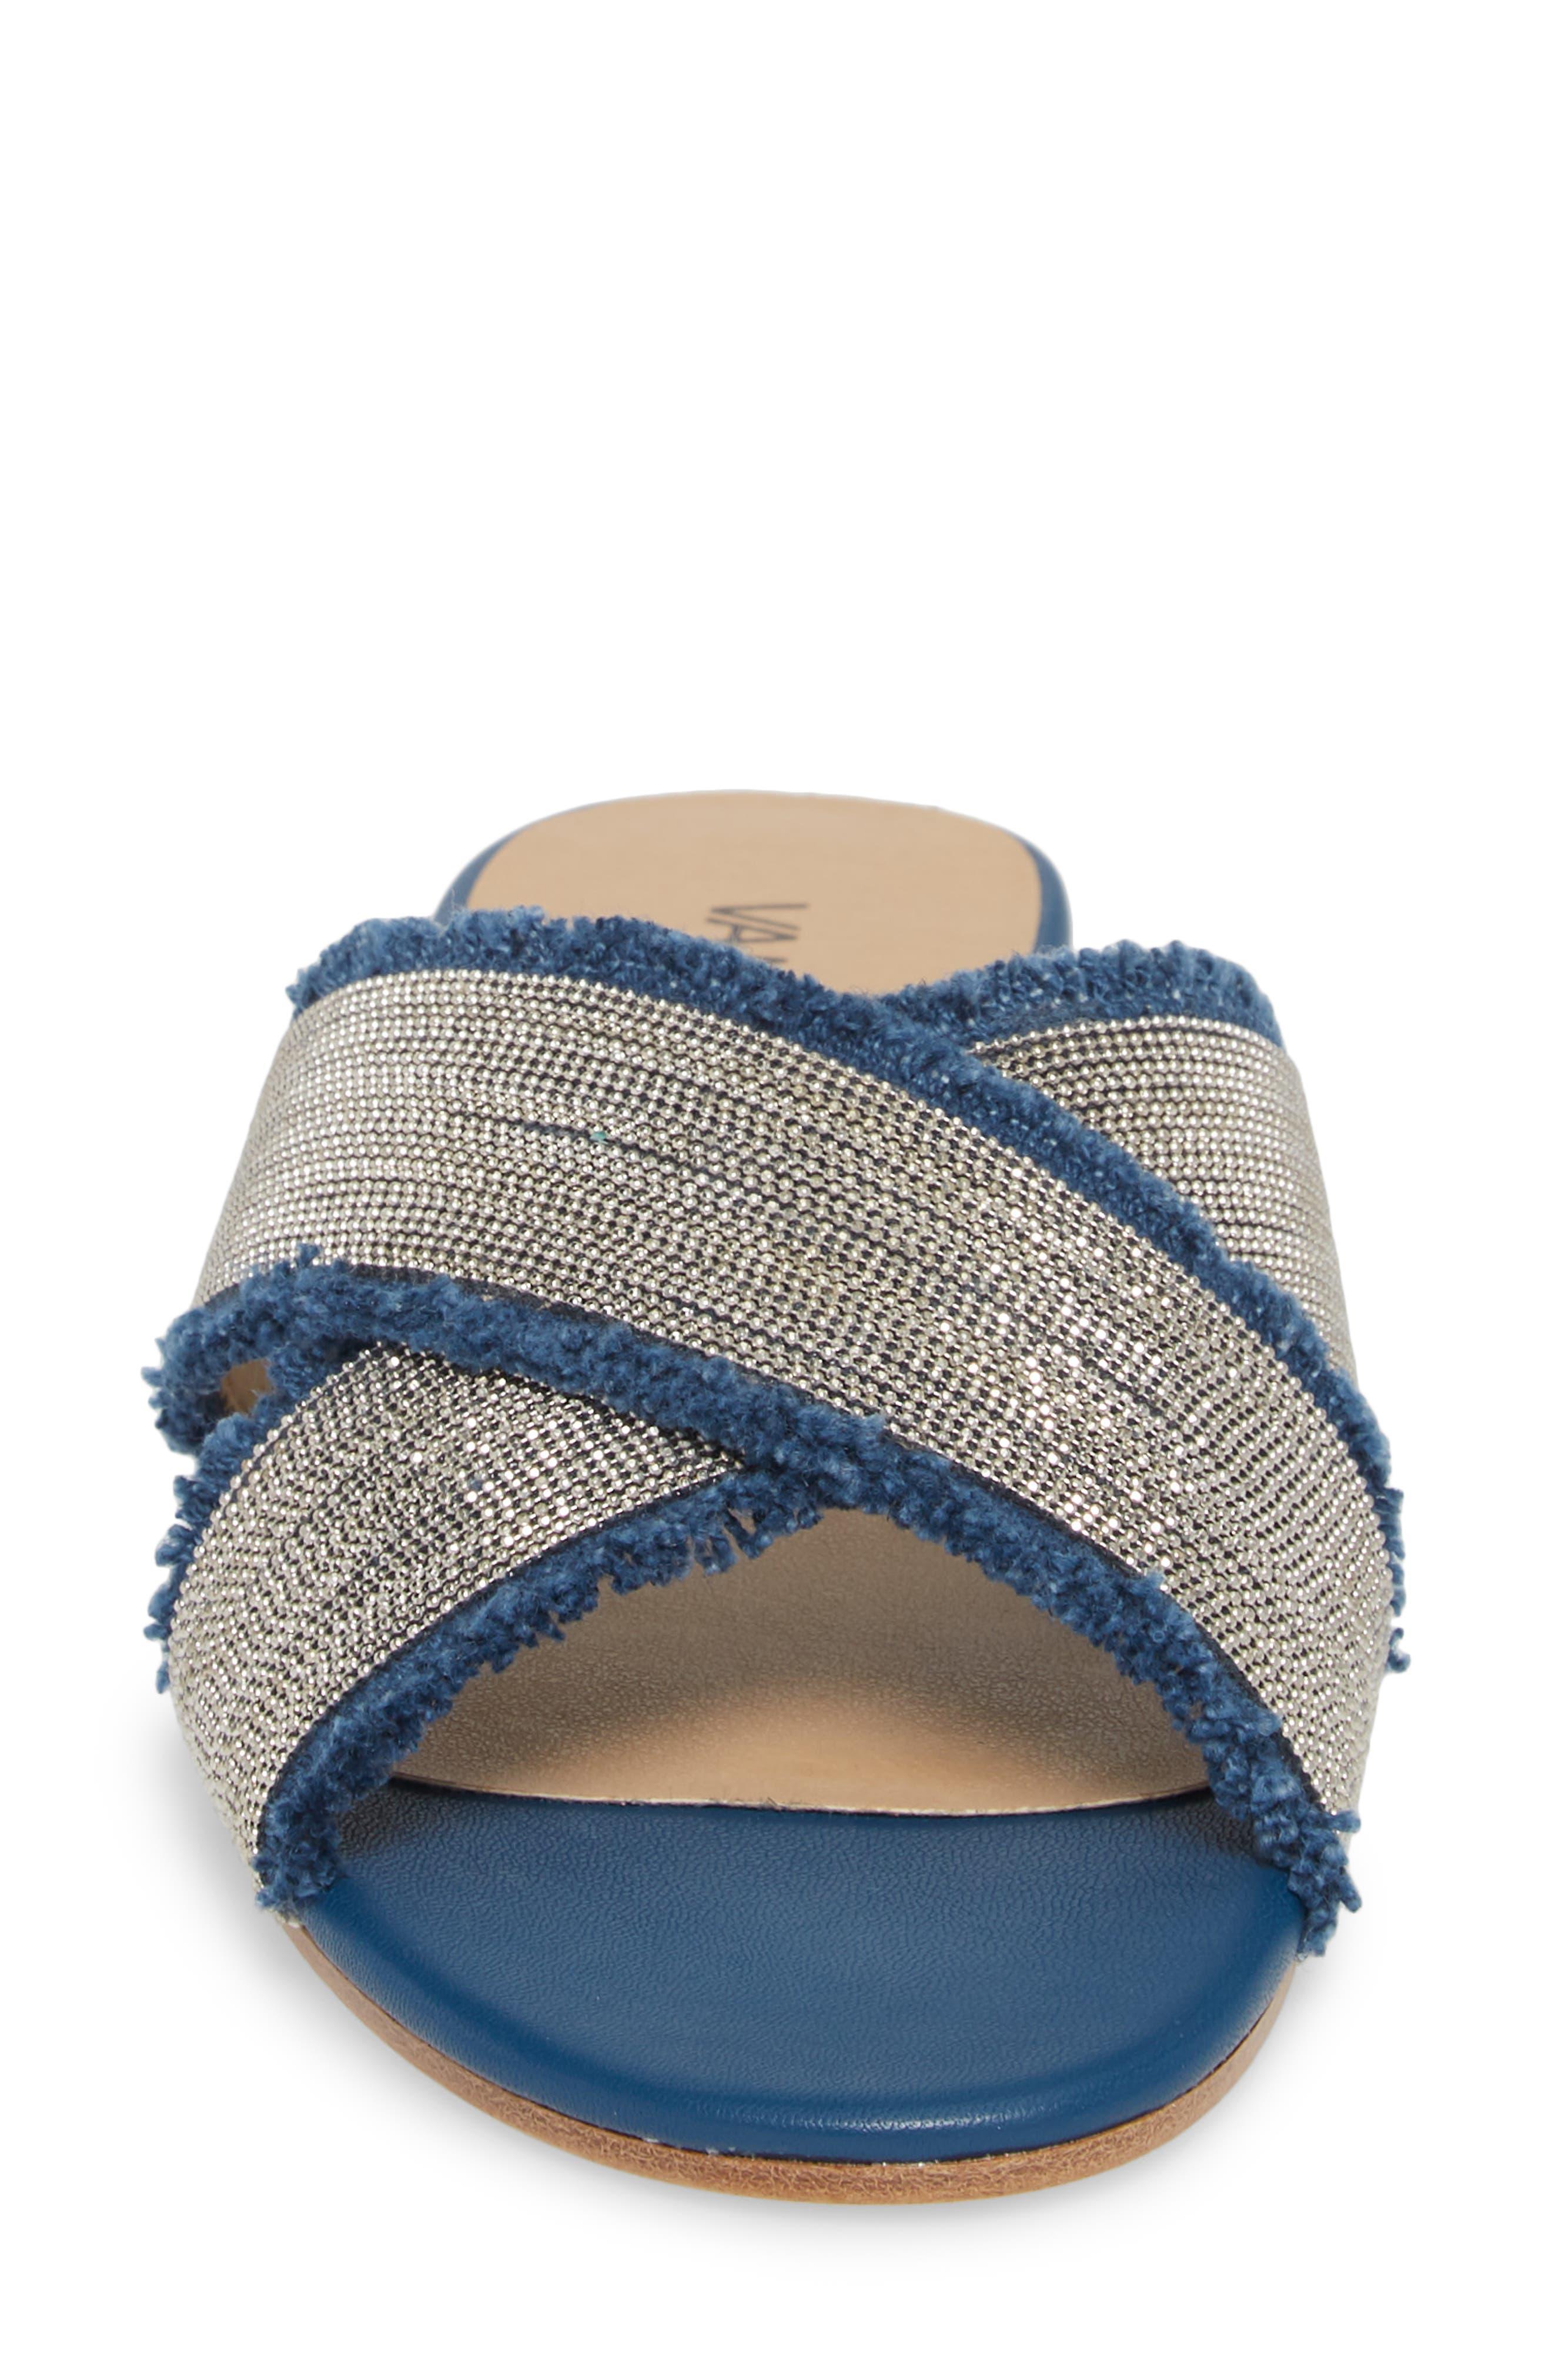 Baret Embellished Cross Strap Slide Sandal,                             Alternate thumbnail 4, color,                             Denim Fabric